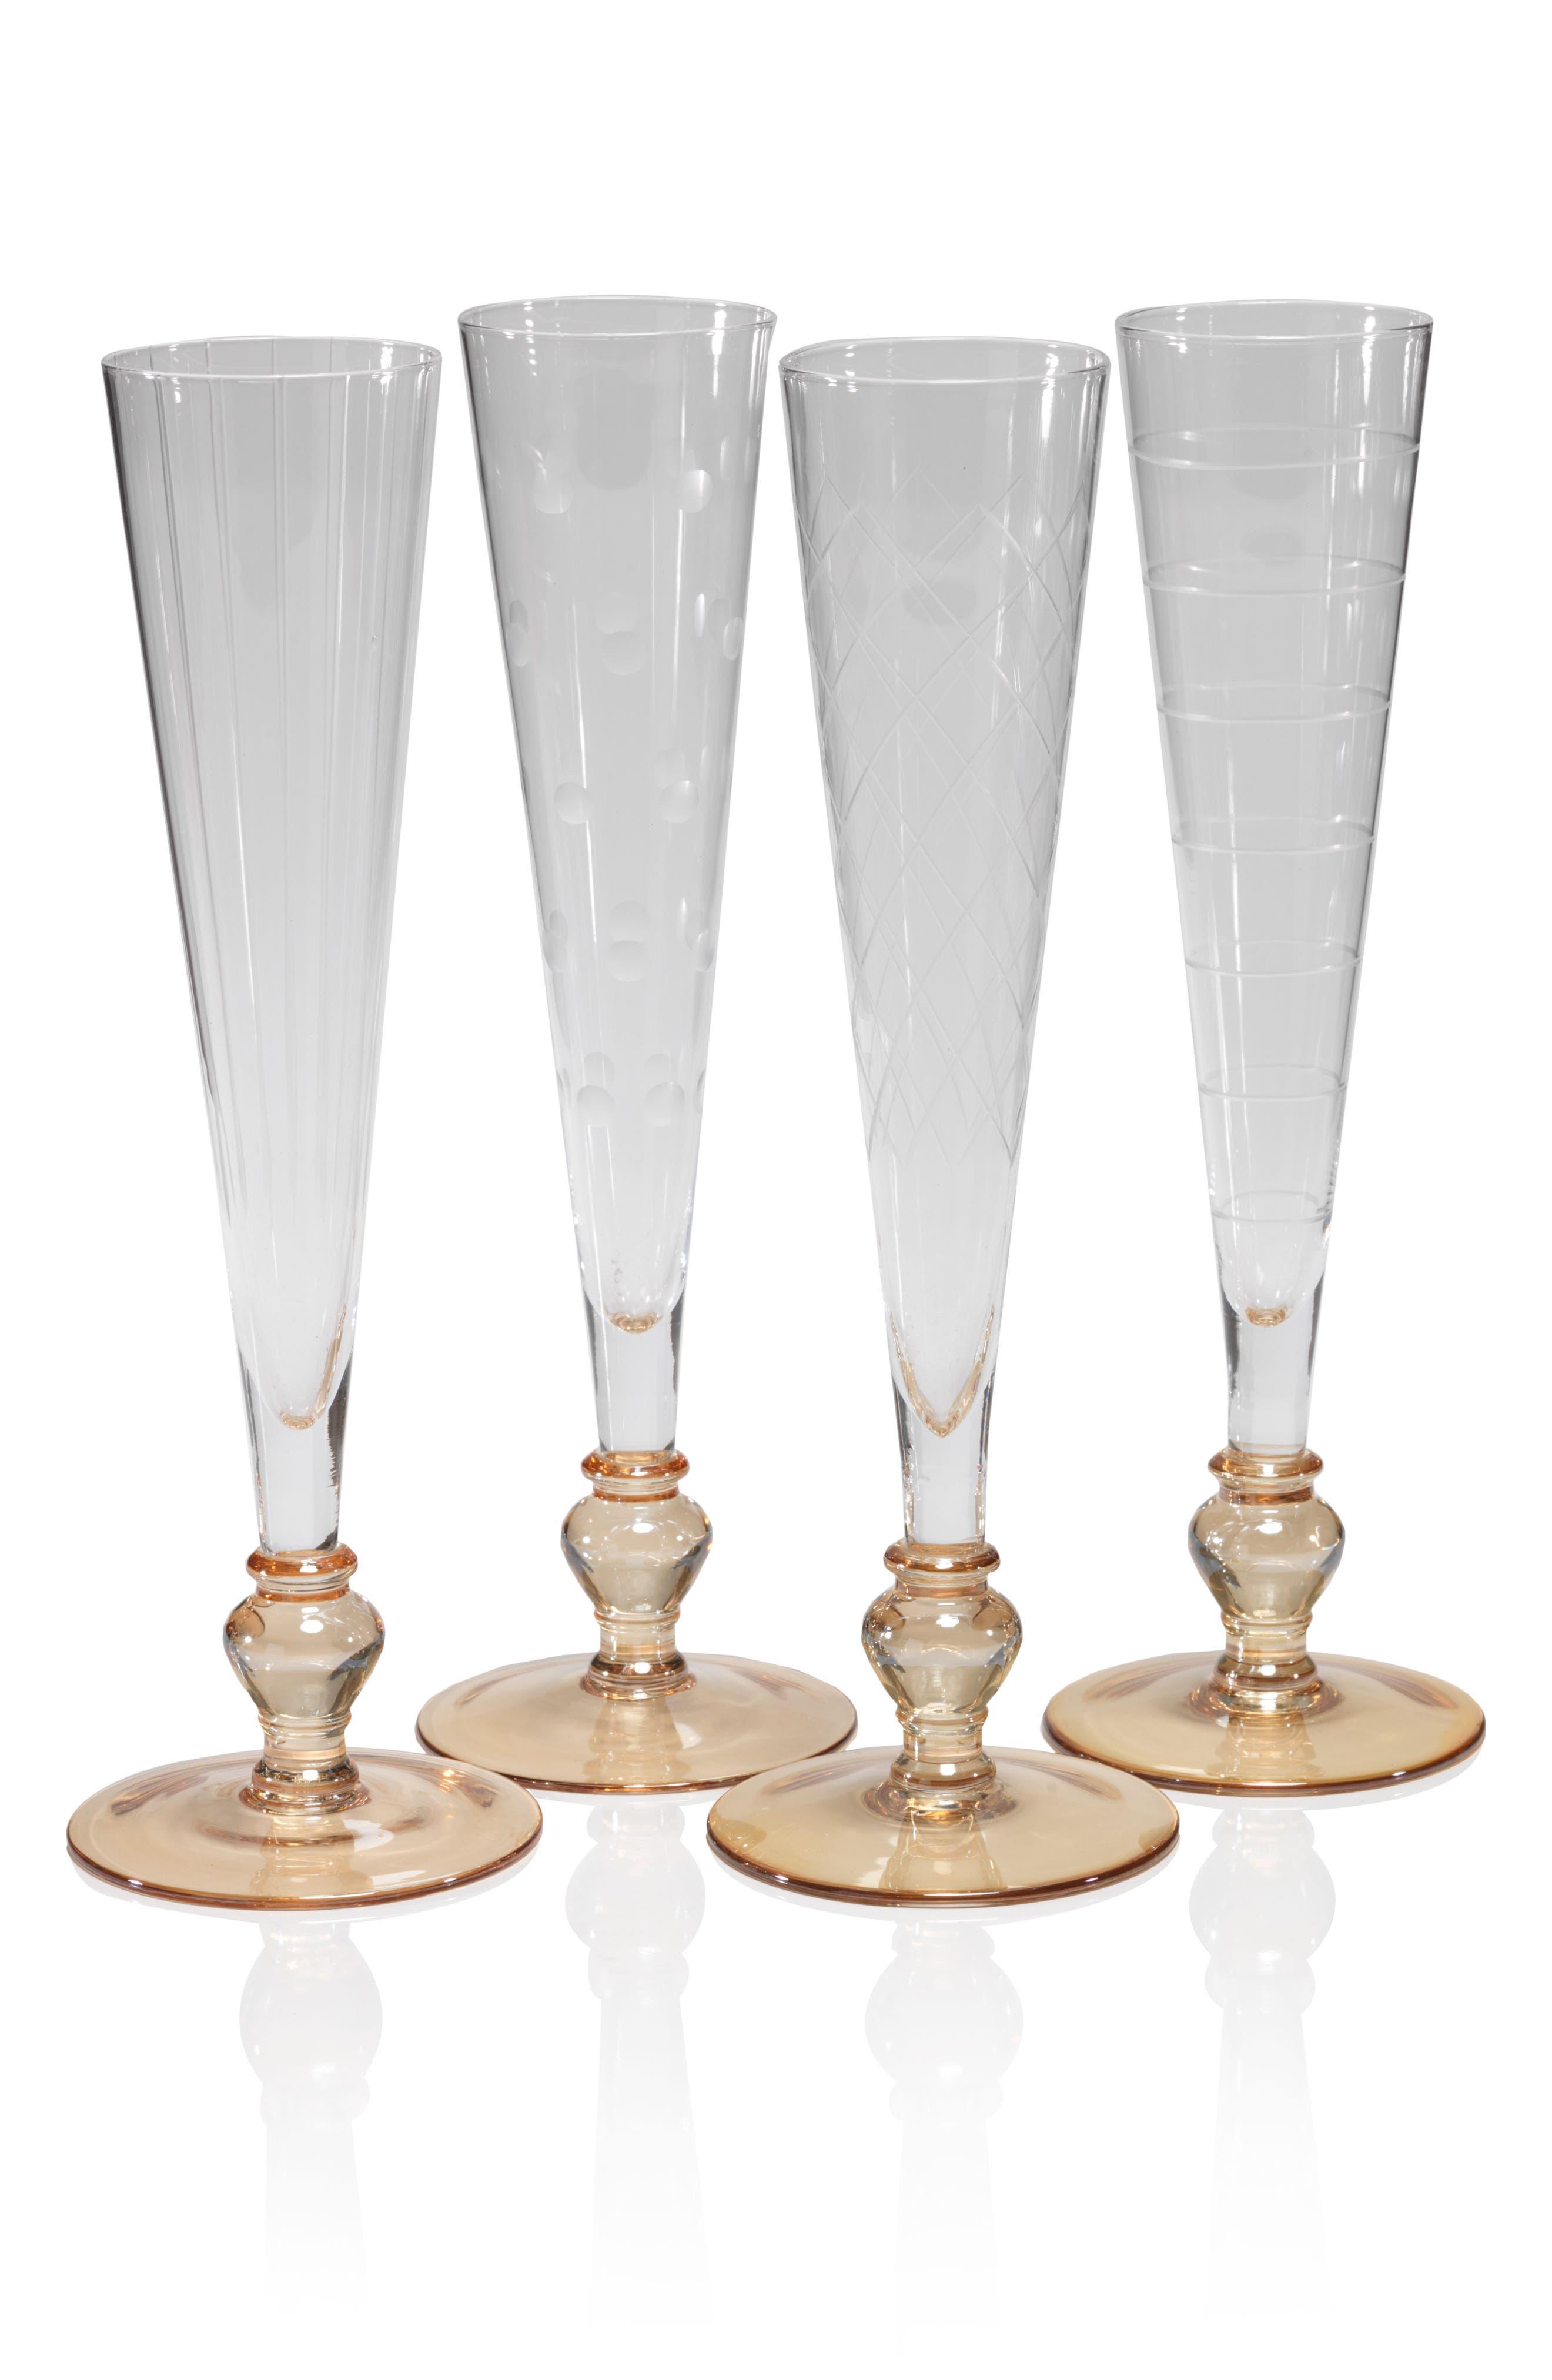 Tatiana Set of 4 Champagne Flutes,                         Main,                         color, Amber